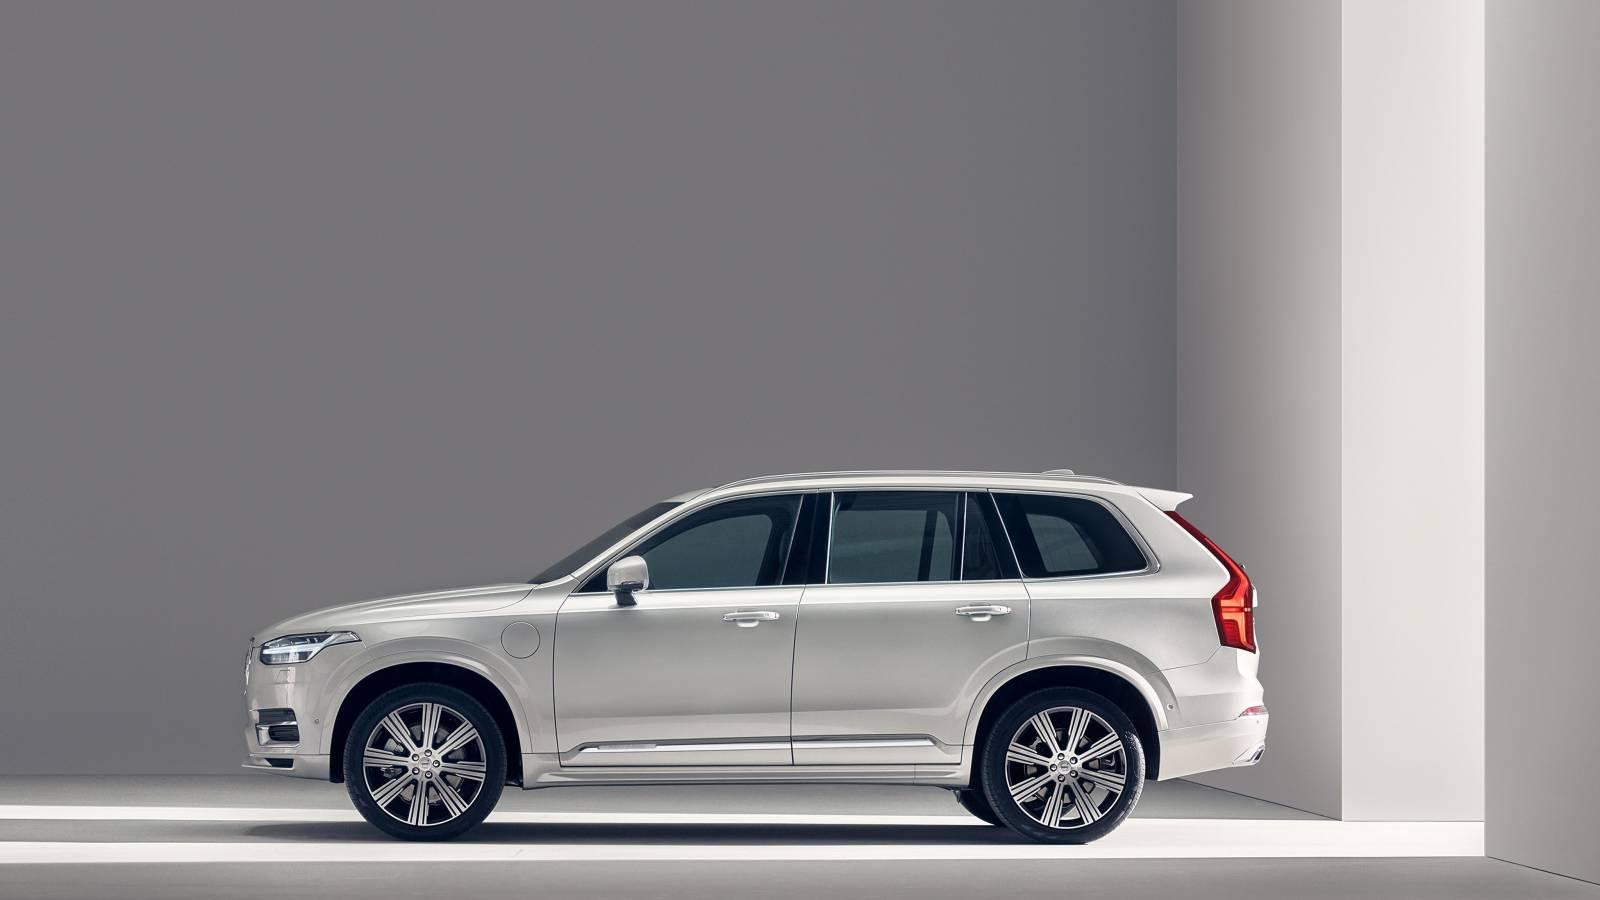 Nové Volvo XC90 T8 Plug-in Hybrid